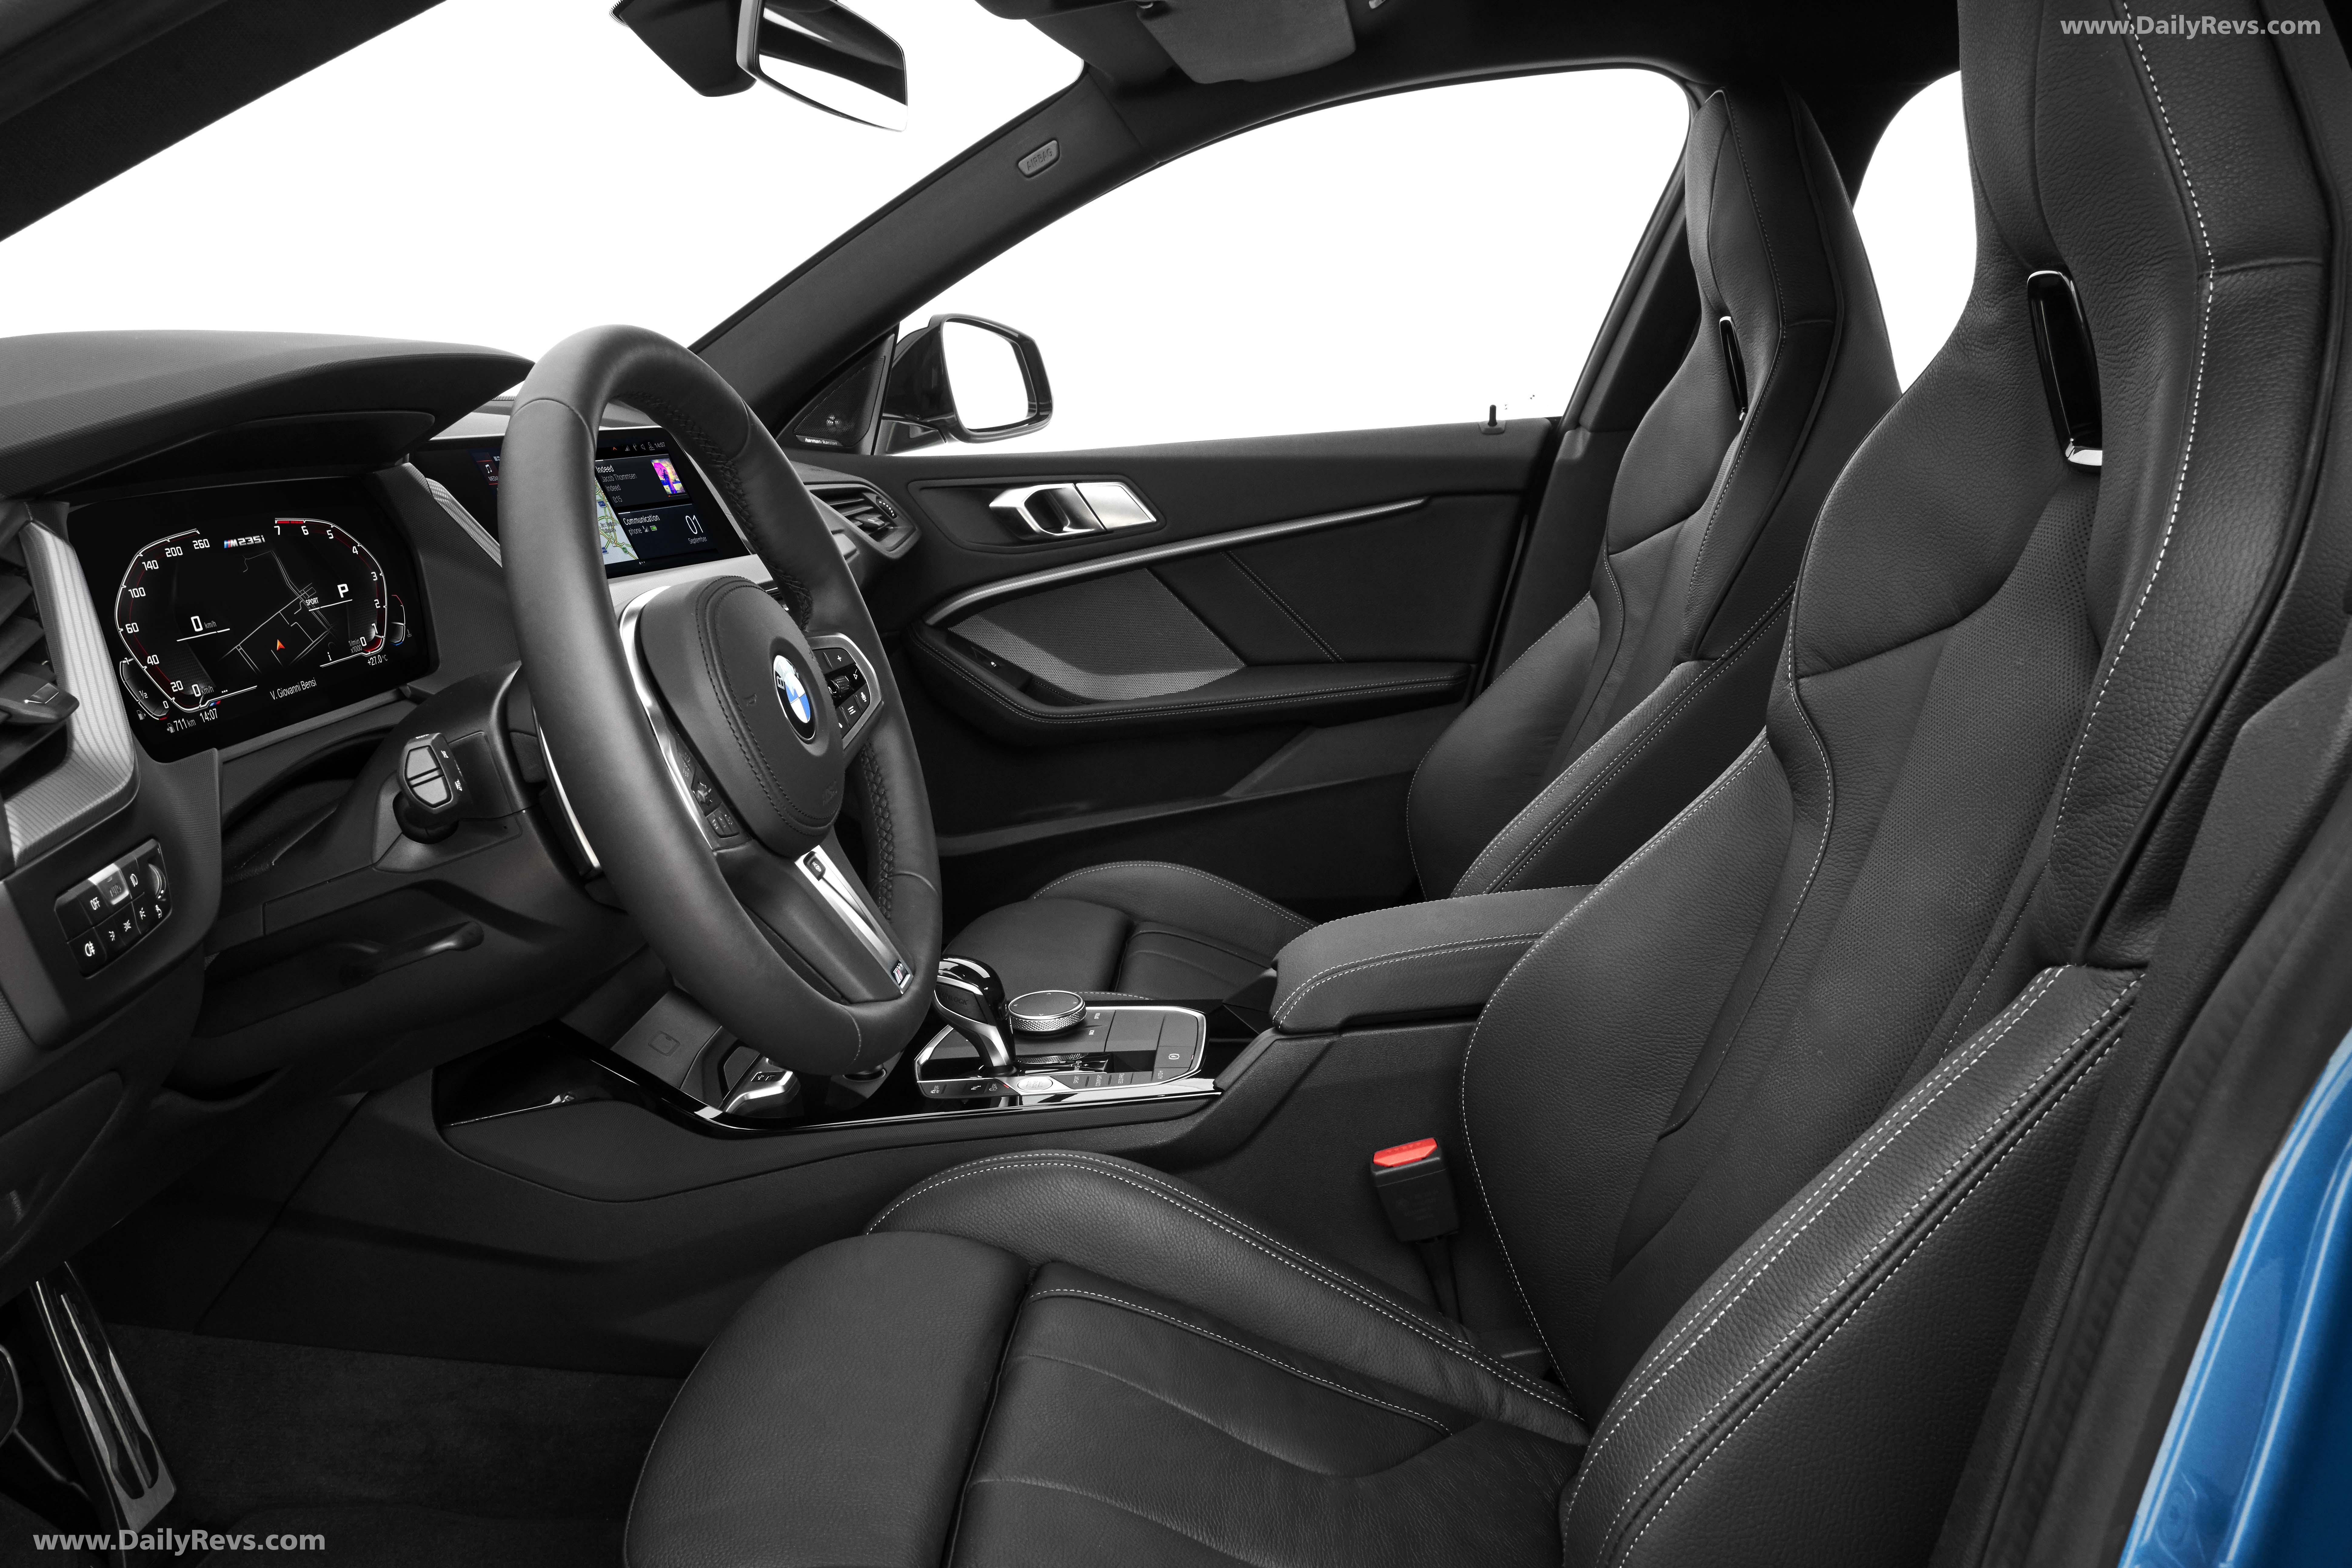 2020 BMW M235i xDrive Gran Coupe full